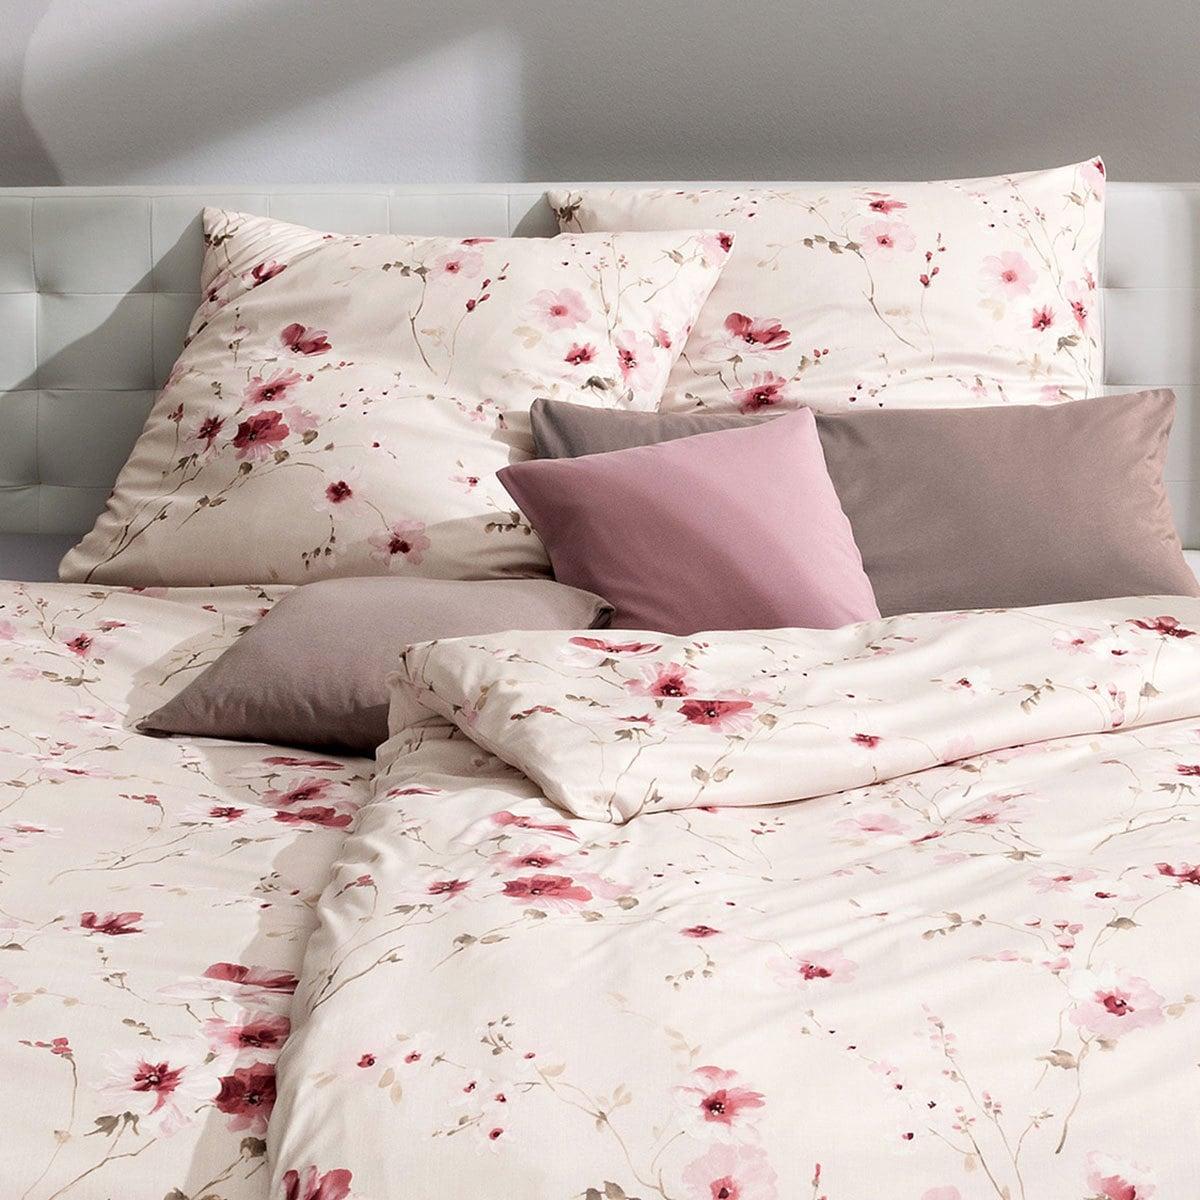 estella mako interlock jersey bettw sche emma azalee. Black Bedroom Furniture Sets. Home Design Ideas